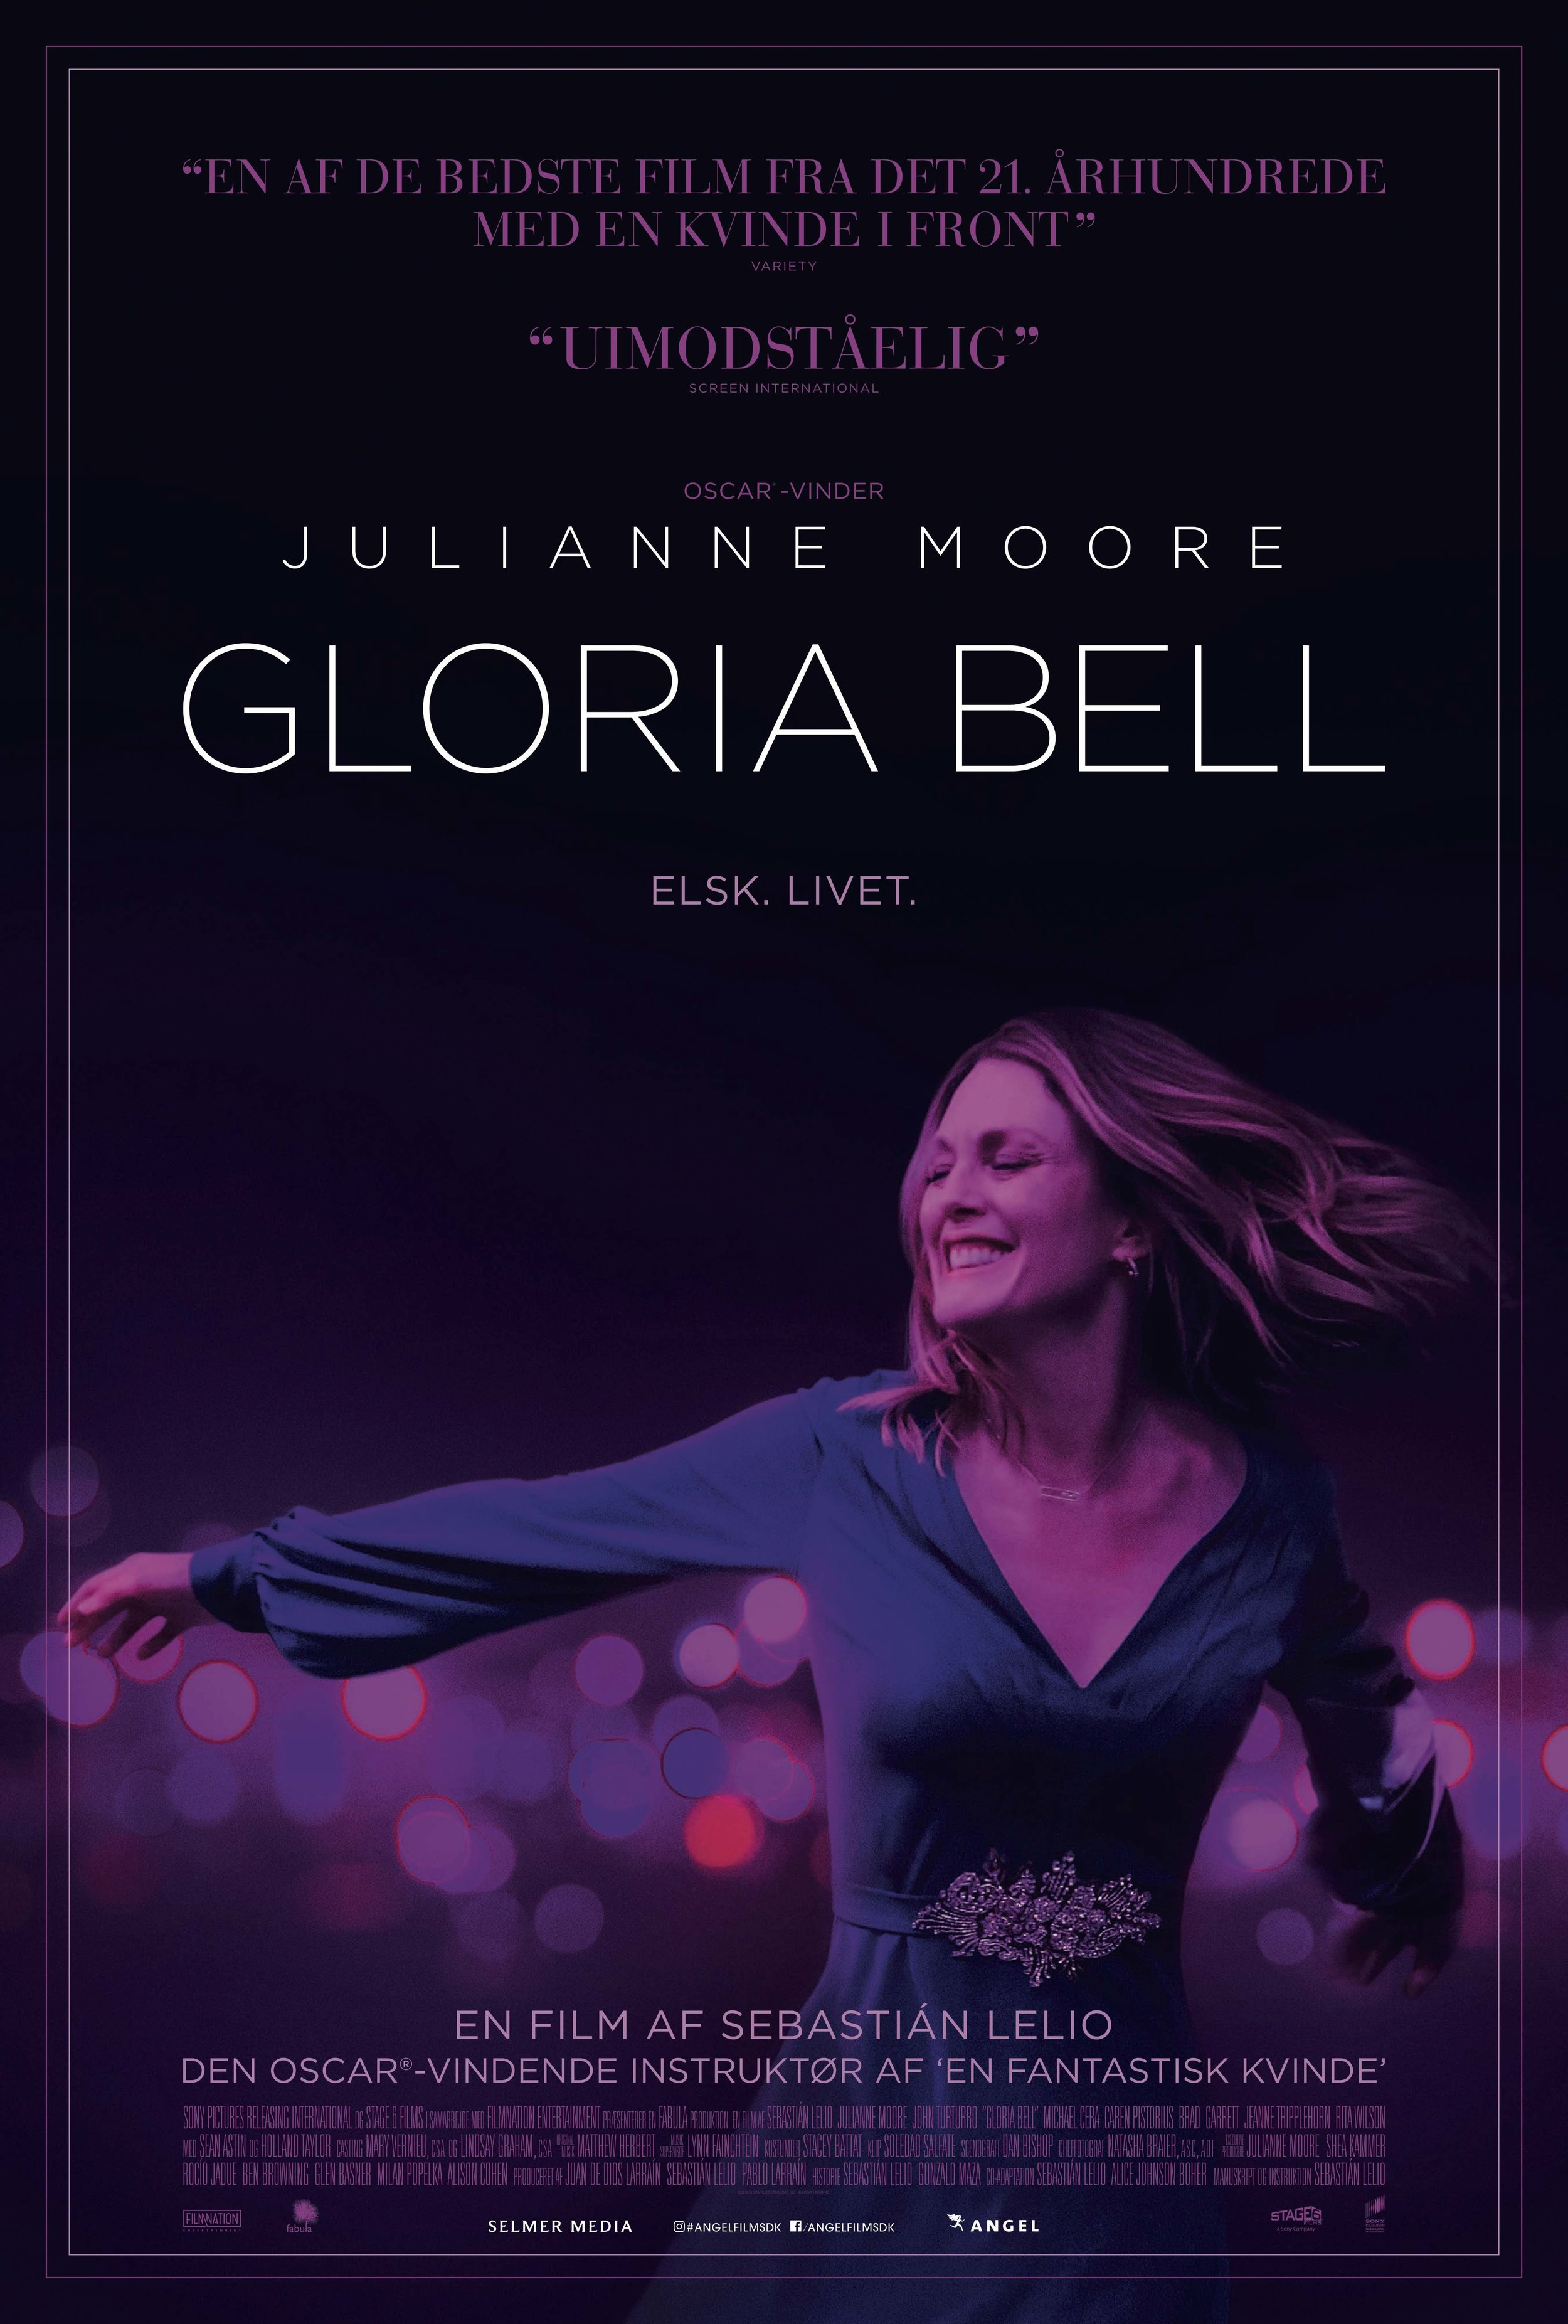 poster_gloria bell.jpg